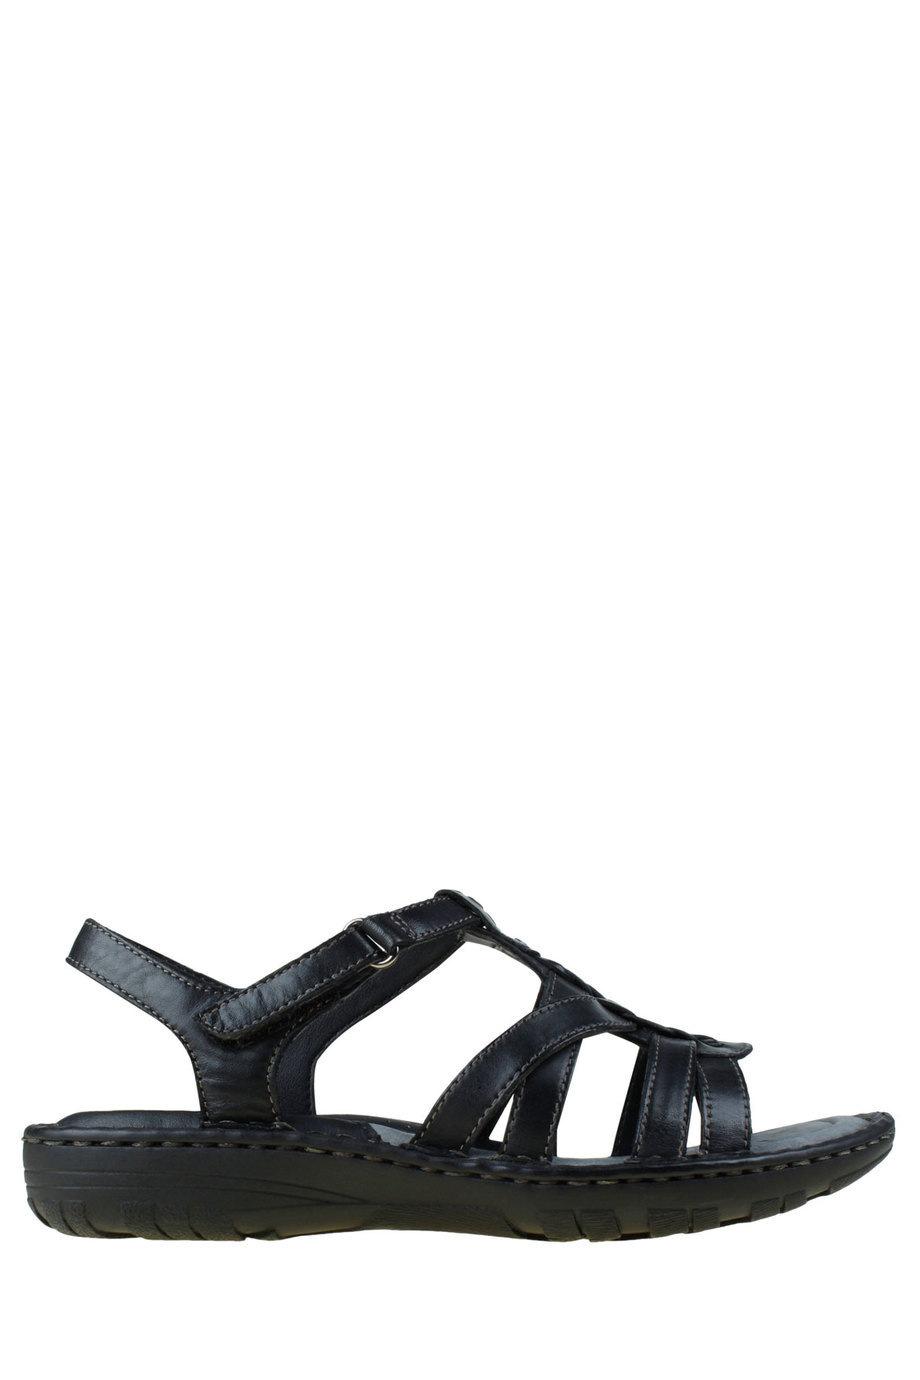 Black sandals myer - Black Sandals Myer 5